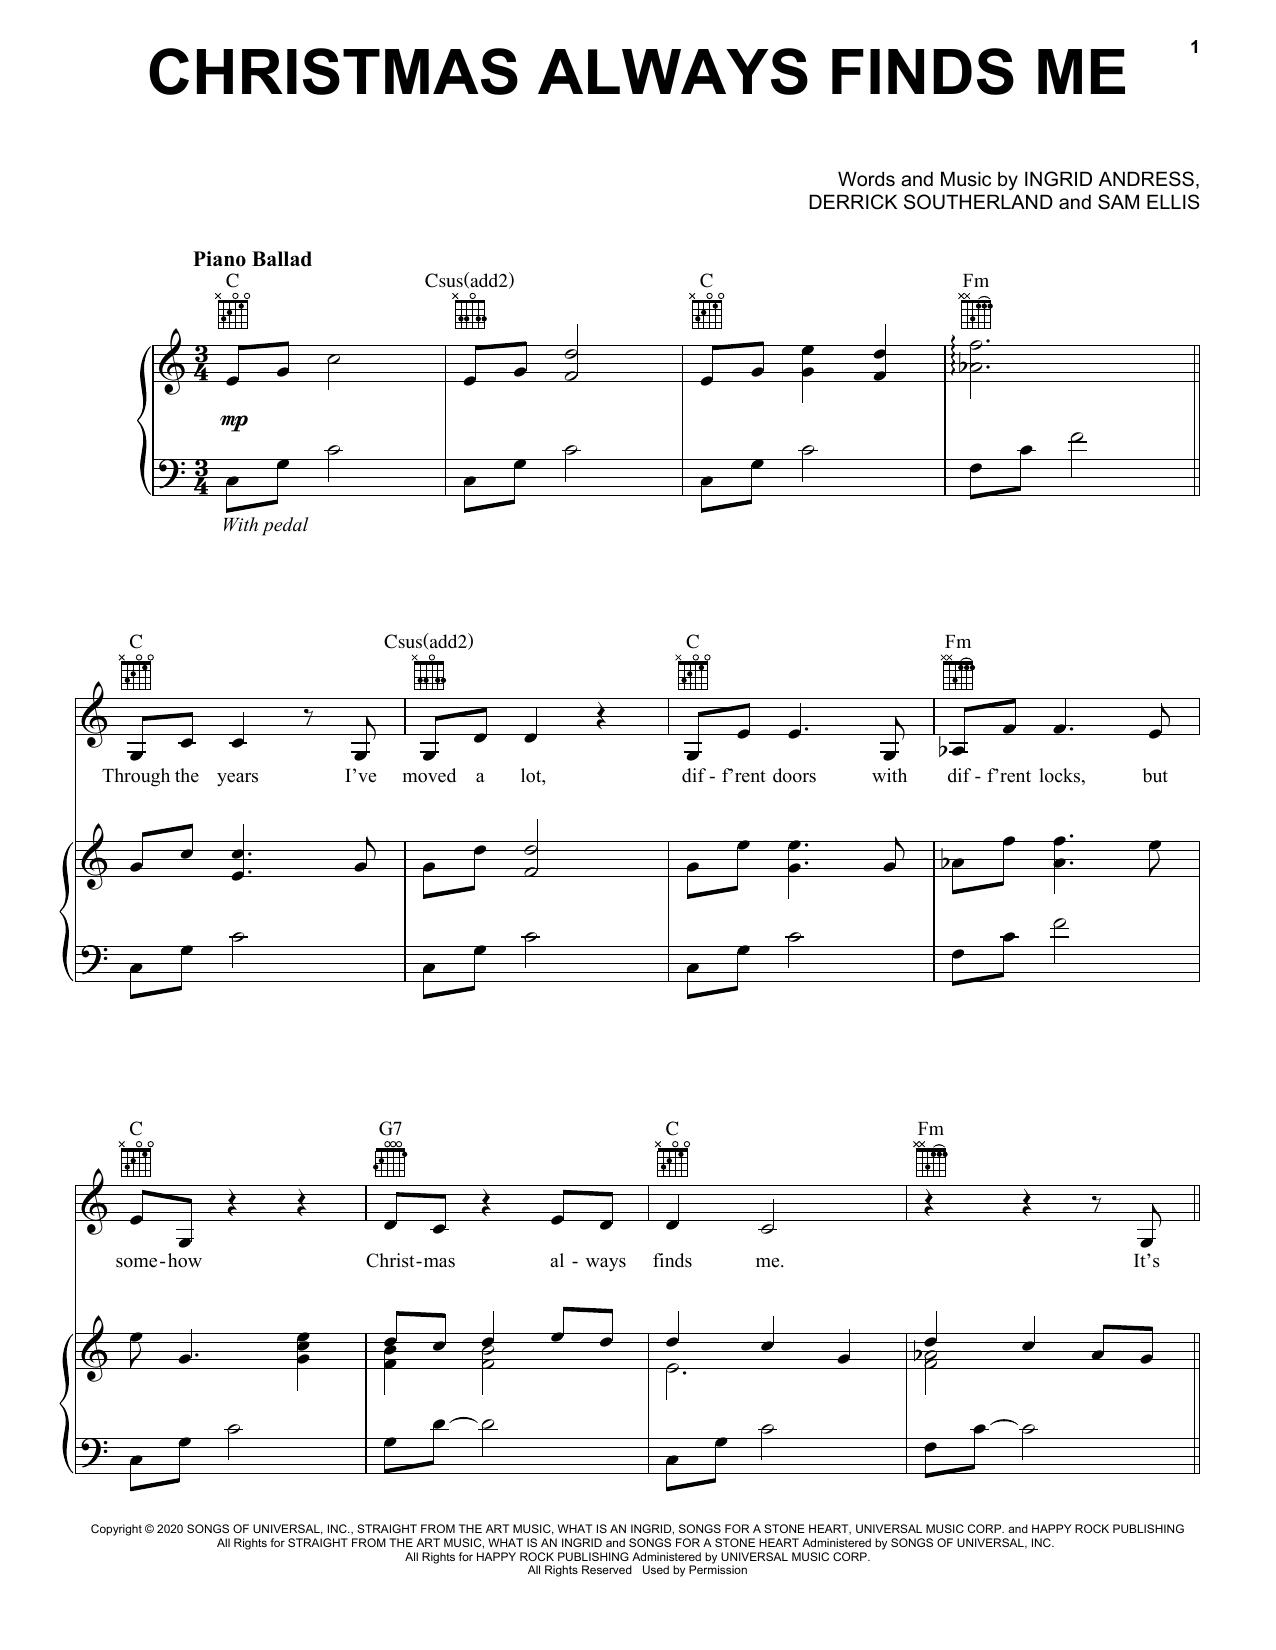 Ingrid Andress Christmas Always Finds Me sheet music notes printable PDF score